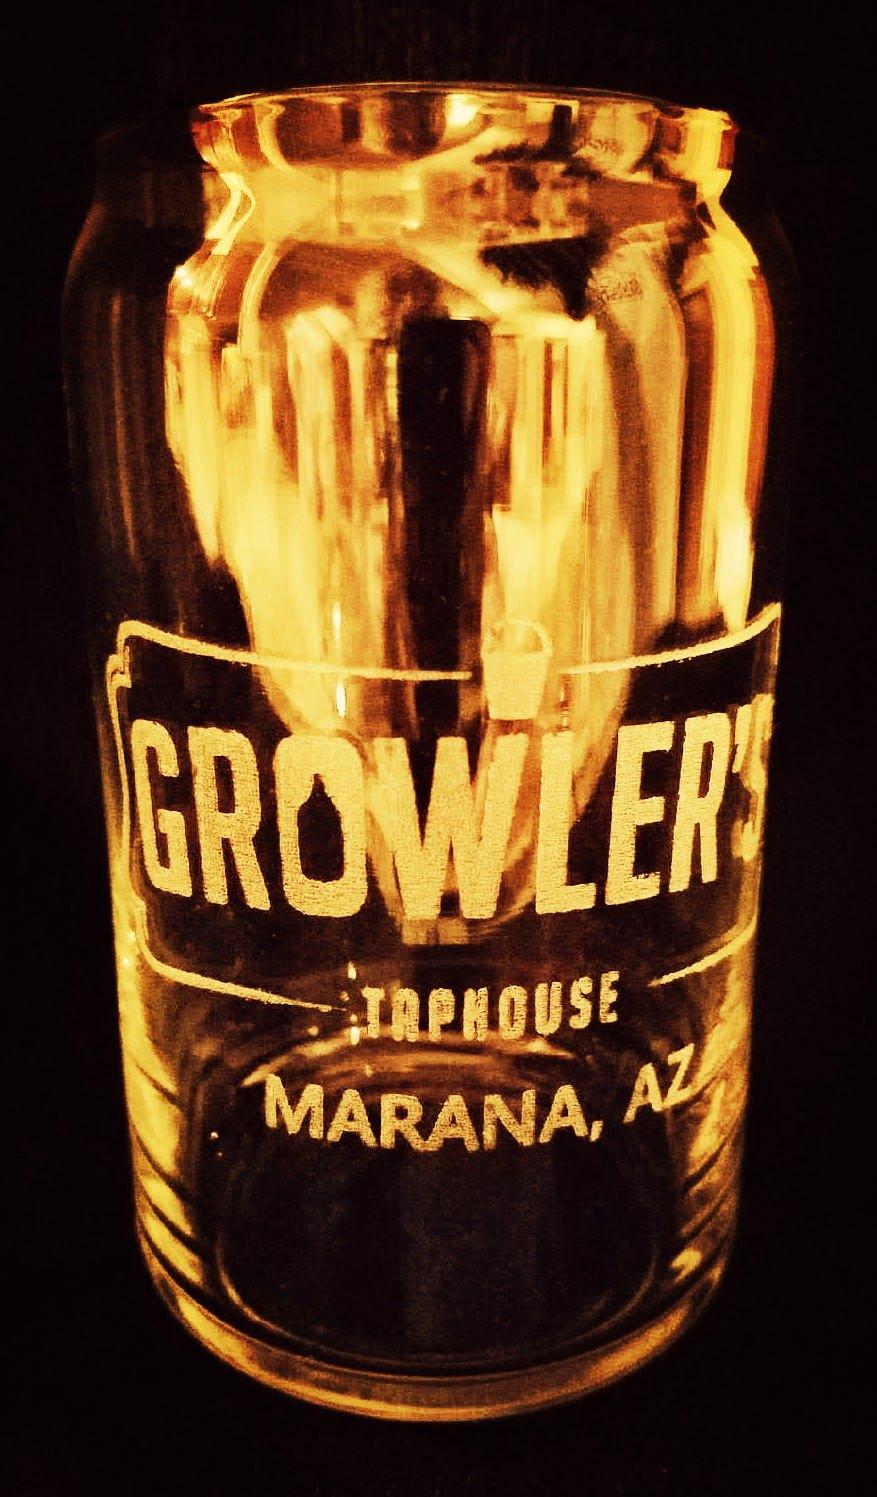 Growler's glass